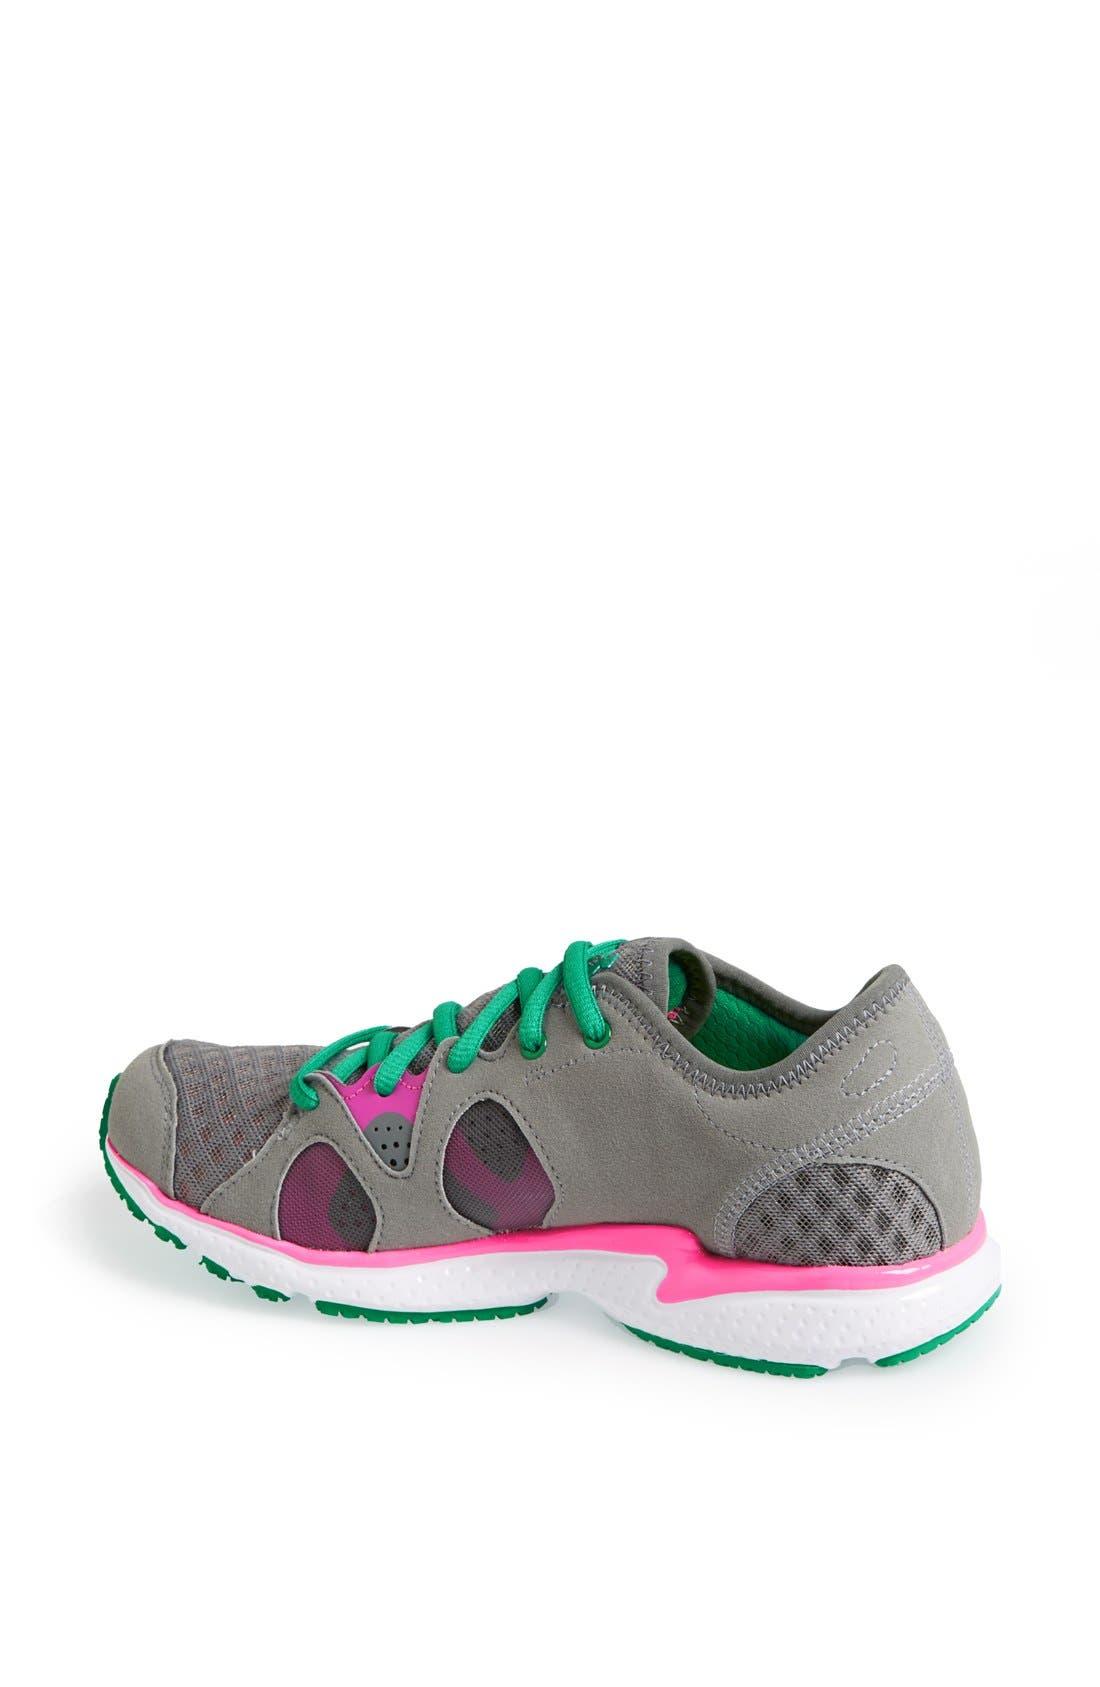 Alternate Image 2  - Under Armour 'Micro G® Neo Mantis' Running Shoe (Women)